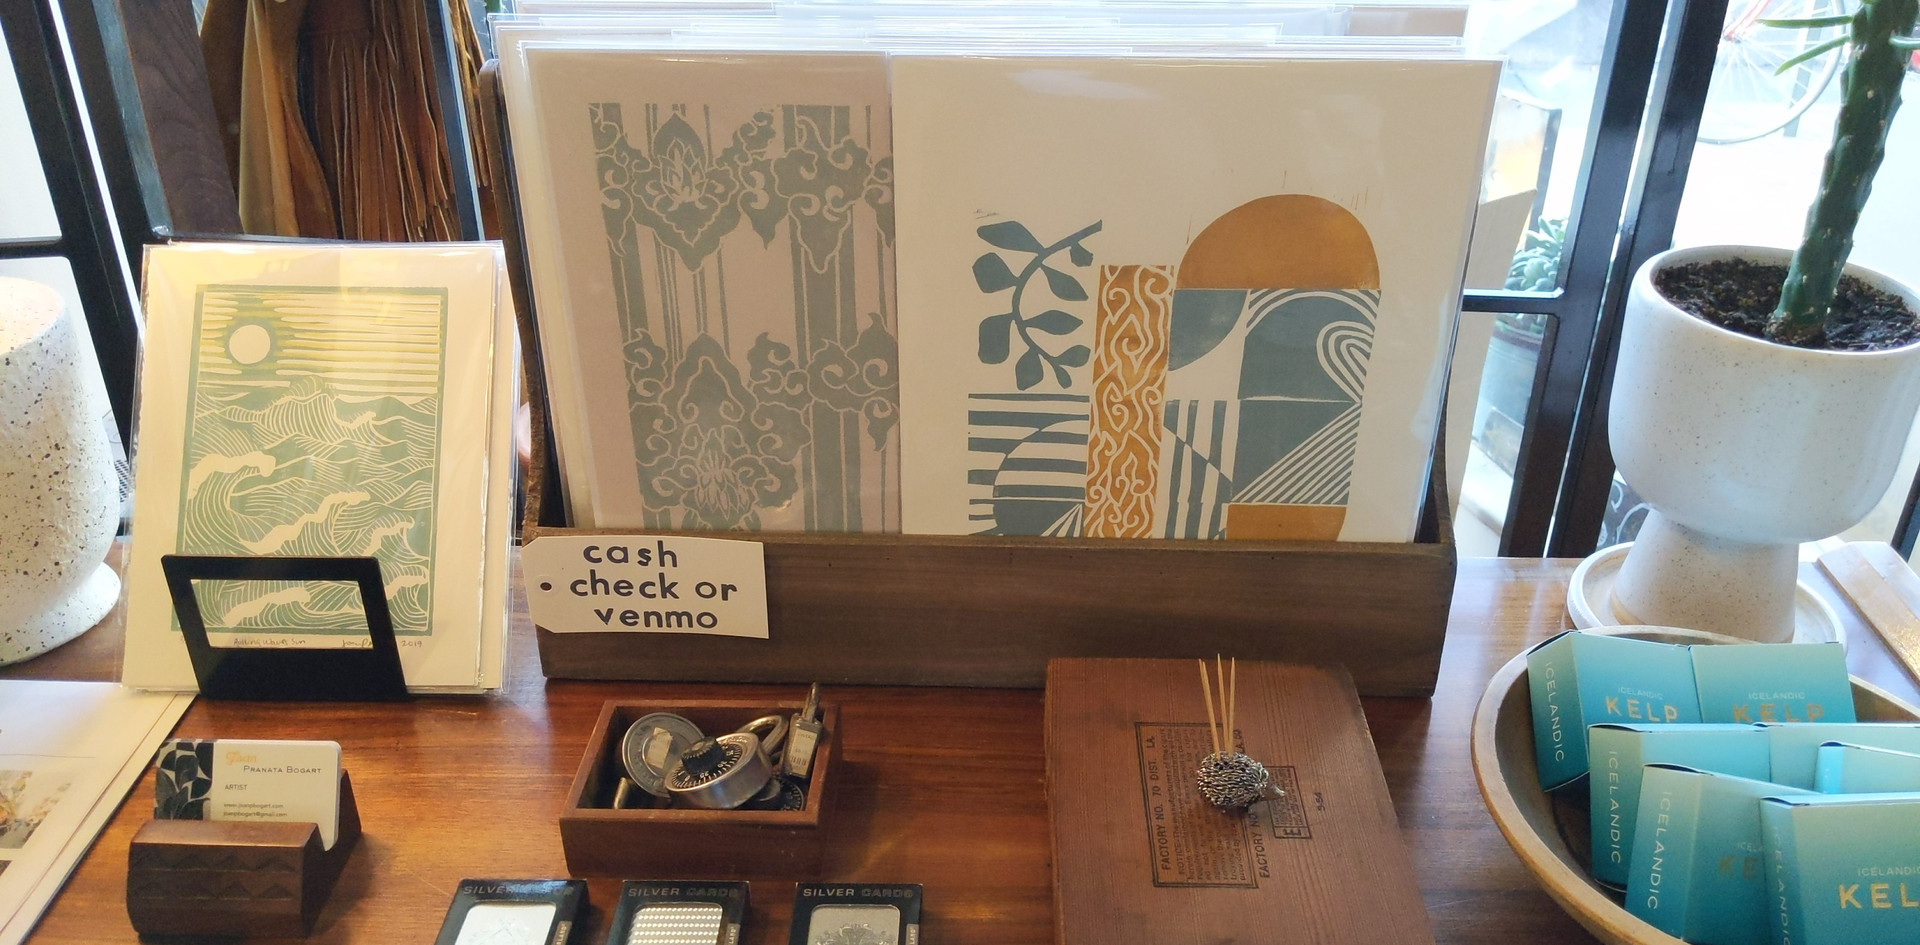 Unframed prints corner